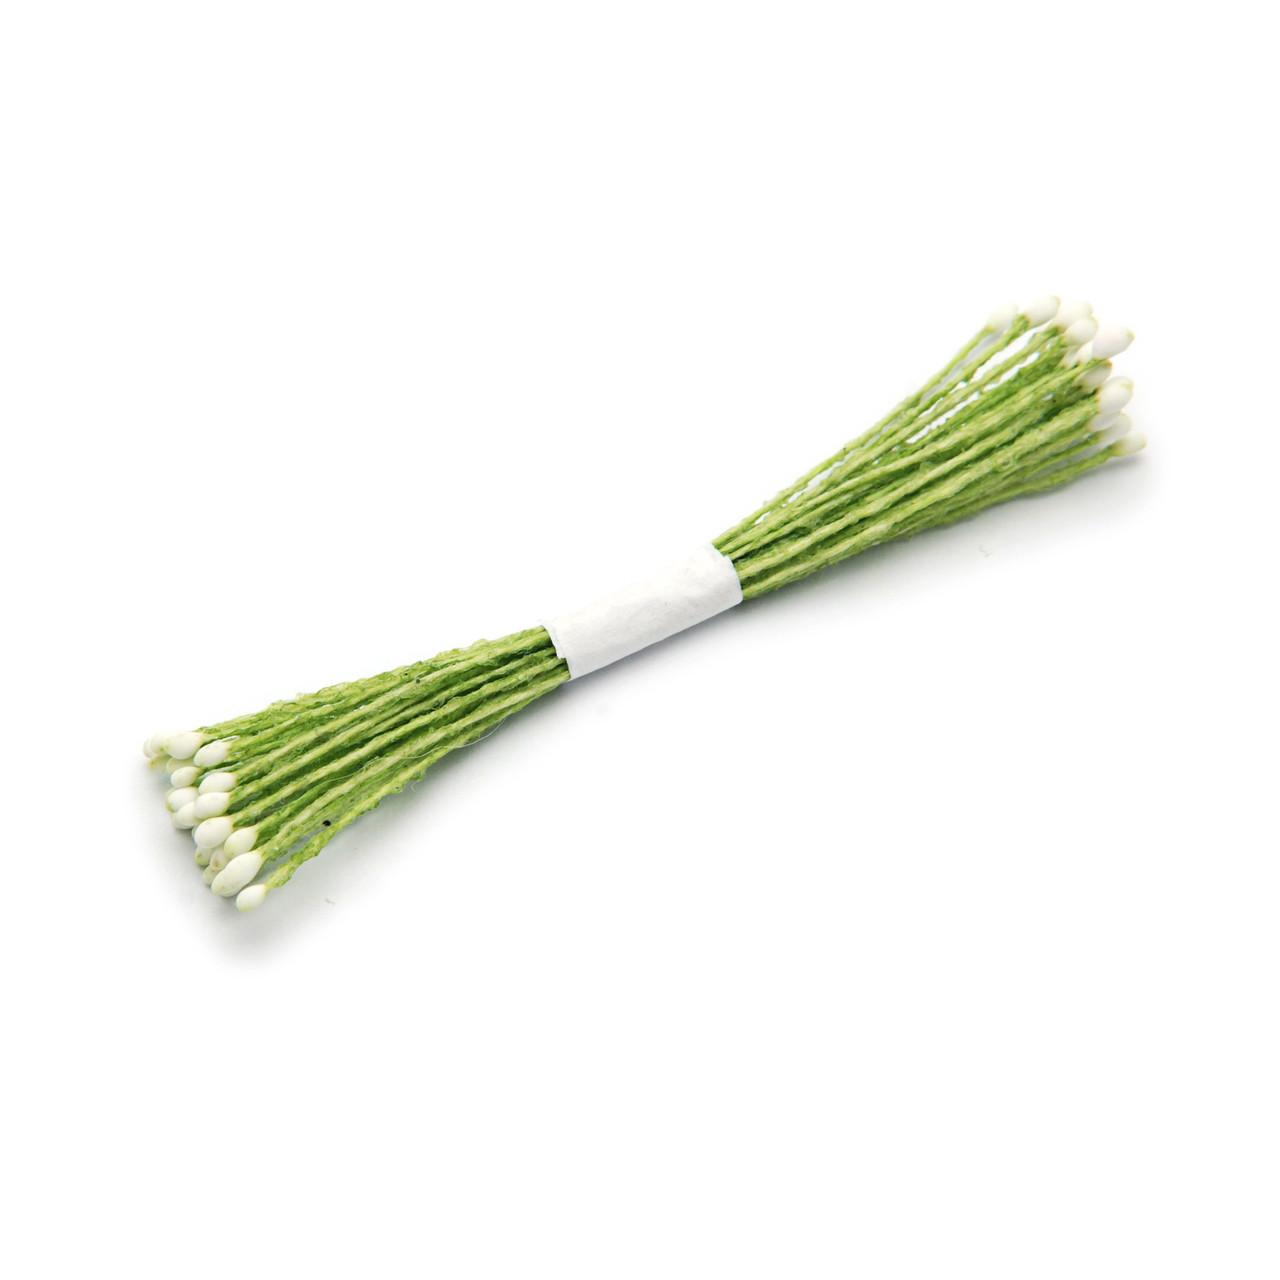 Тайские тычинки мини, 23-25 нитей, 1 мм, БЕЛЫЕ на зеленой нити